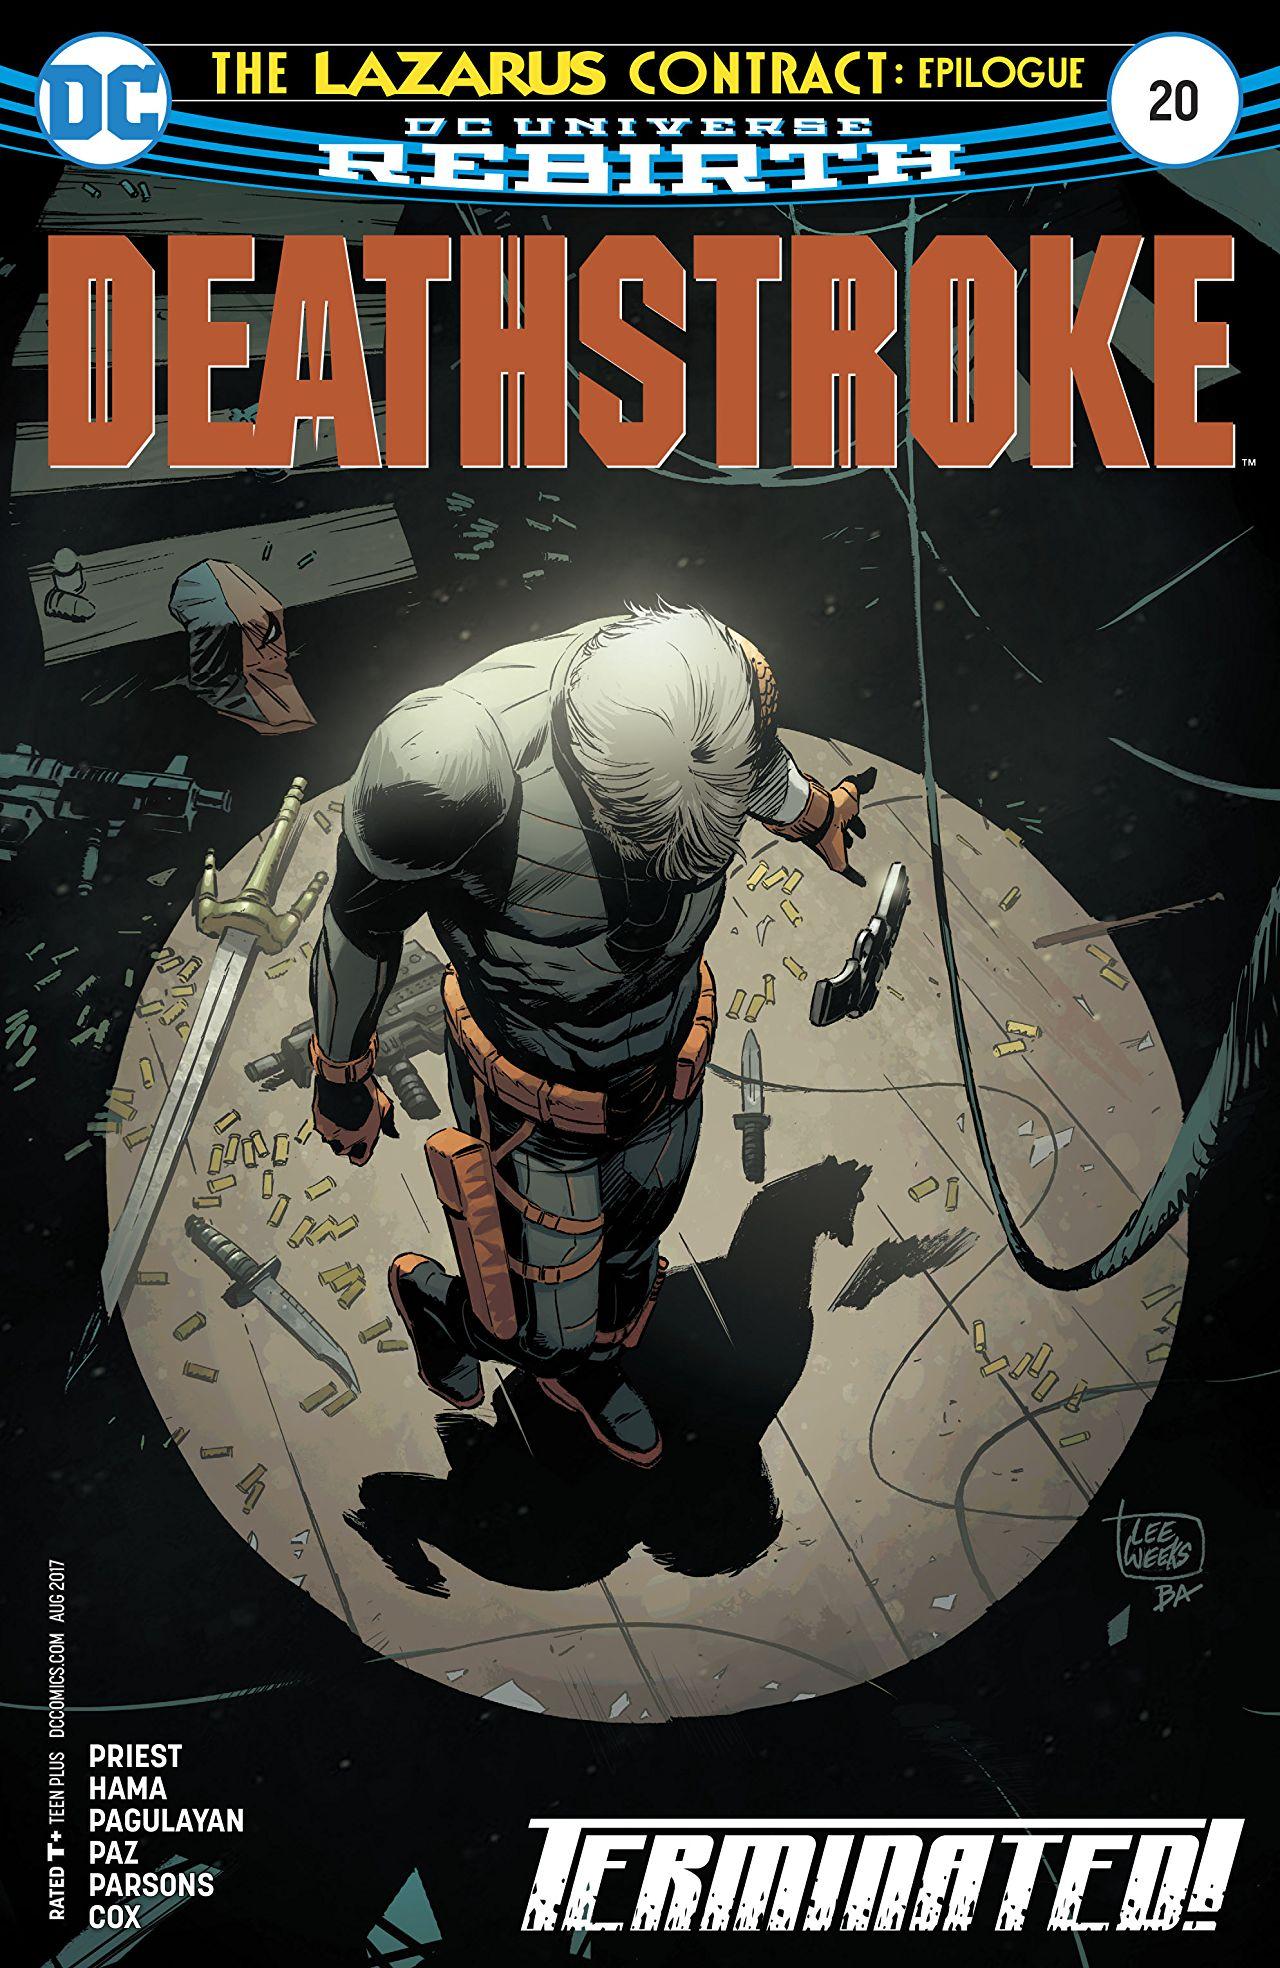 review DEATHSTROKE #20